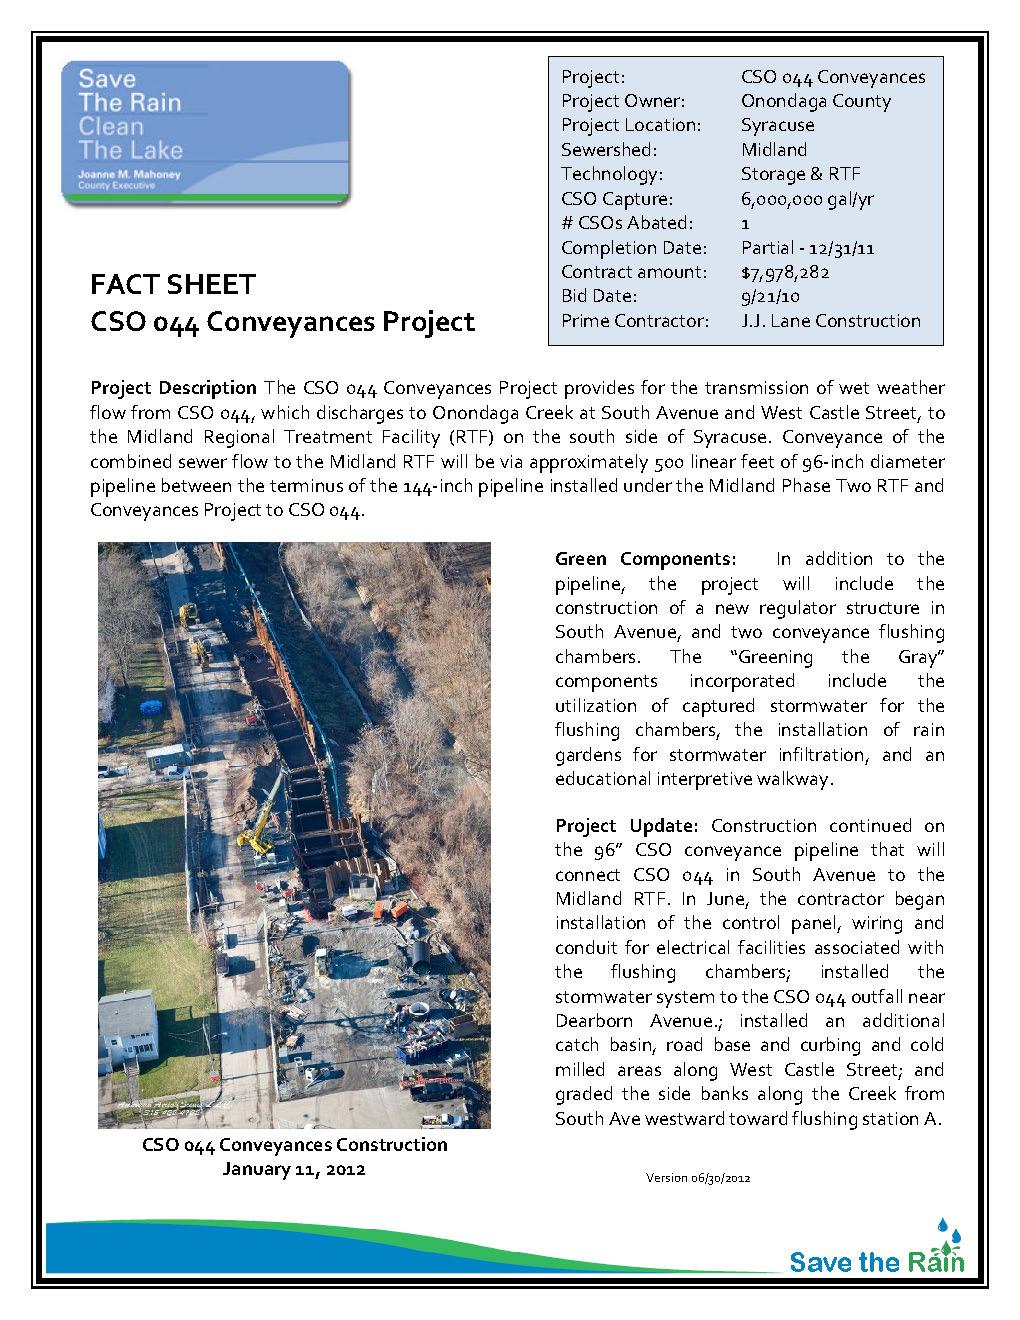 CSO 044 Conveyances Fact Sheet